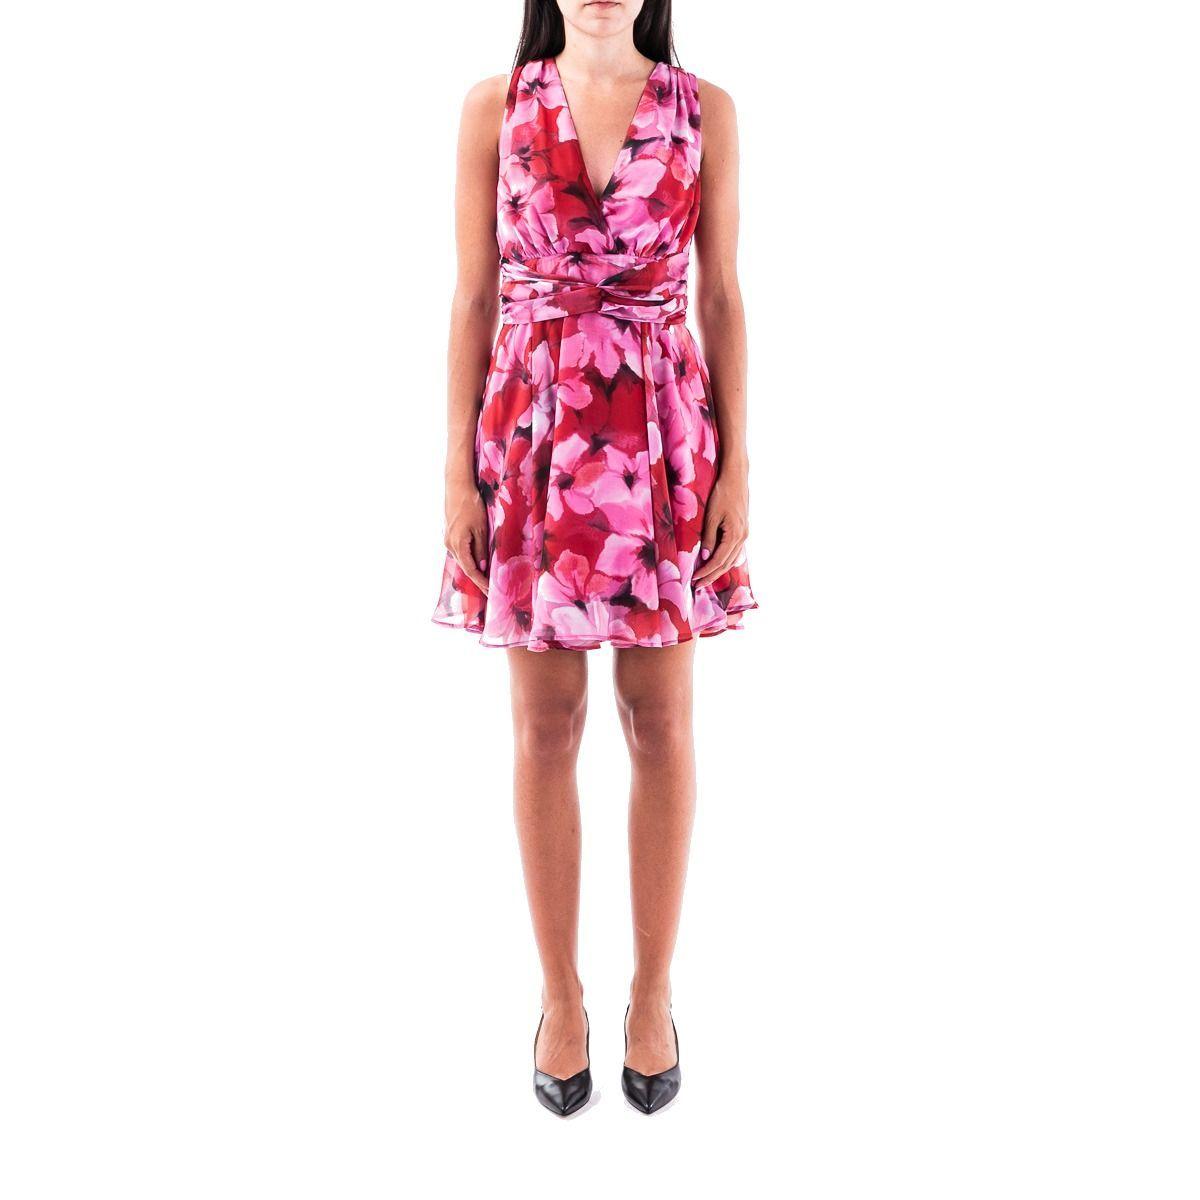 LIU JO WOMEN'S IA0199T2362U9783 FUCHSIA POLYESTER DRESS